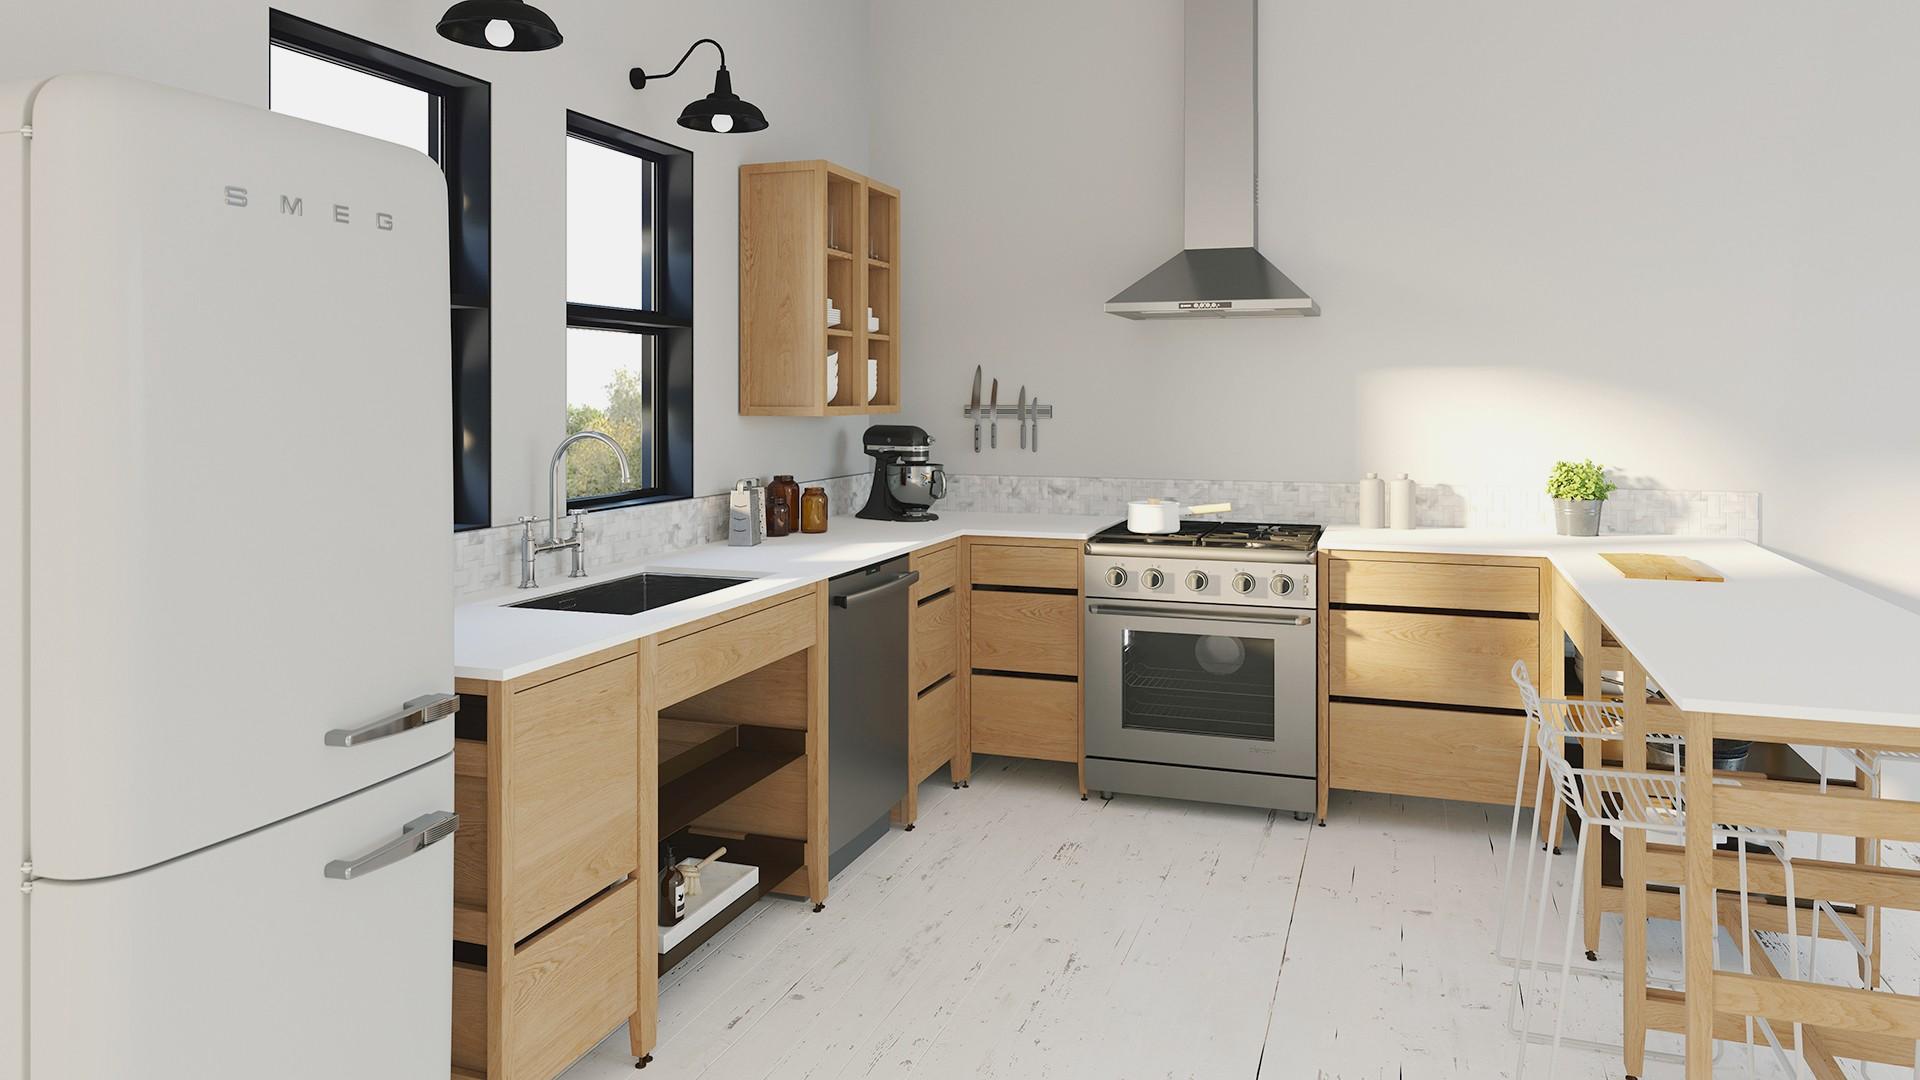 Radix Base Kitchen Cabinet 11 Drawers 110 In White Oak/Black  coquo